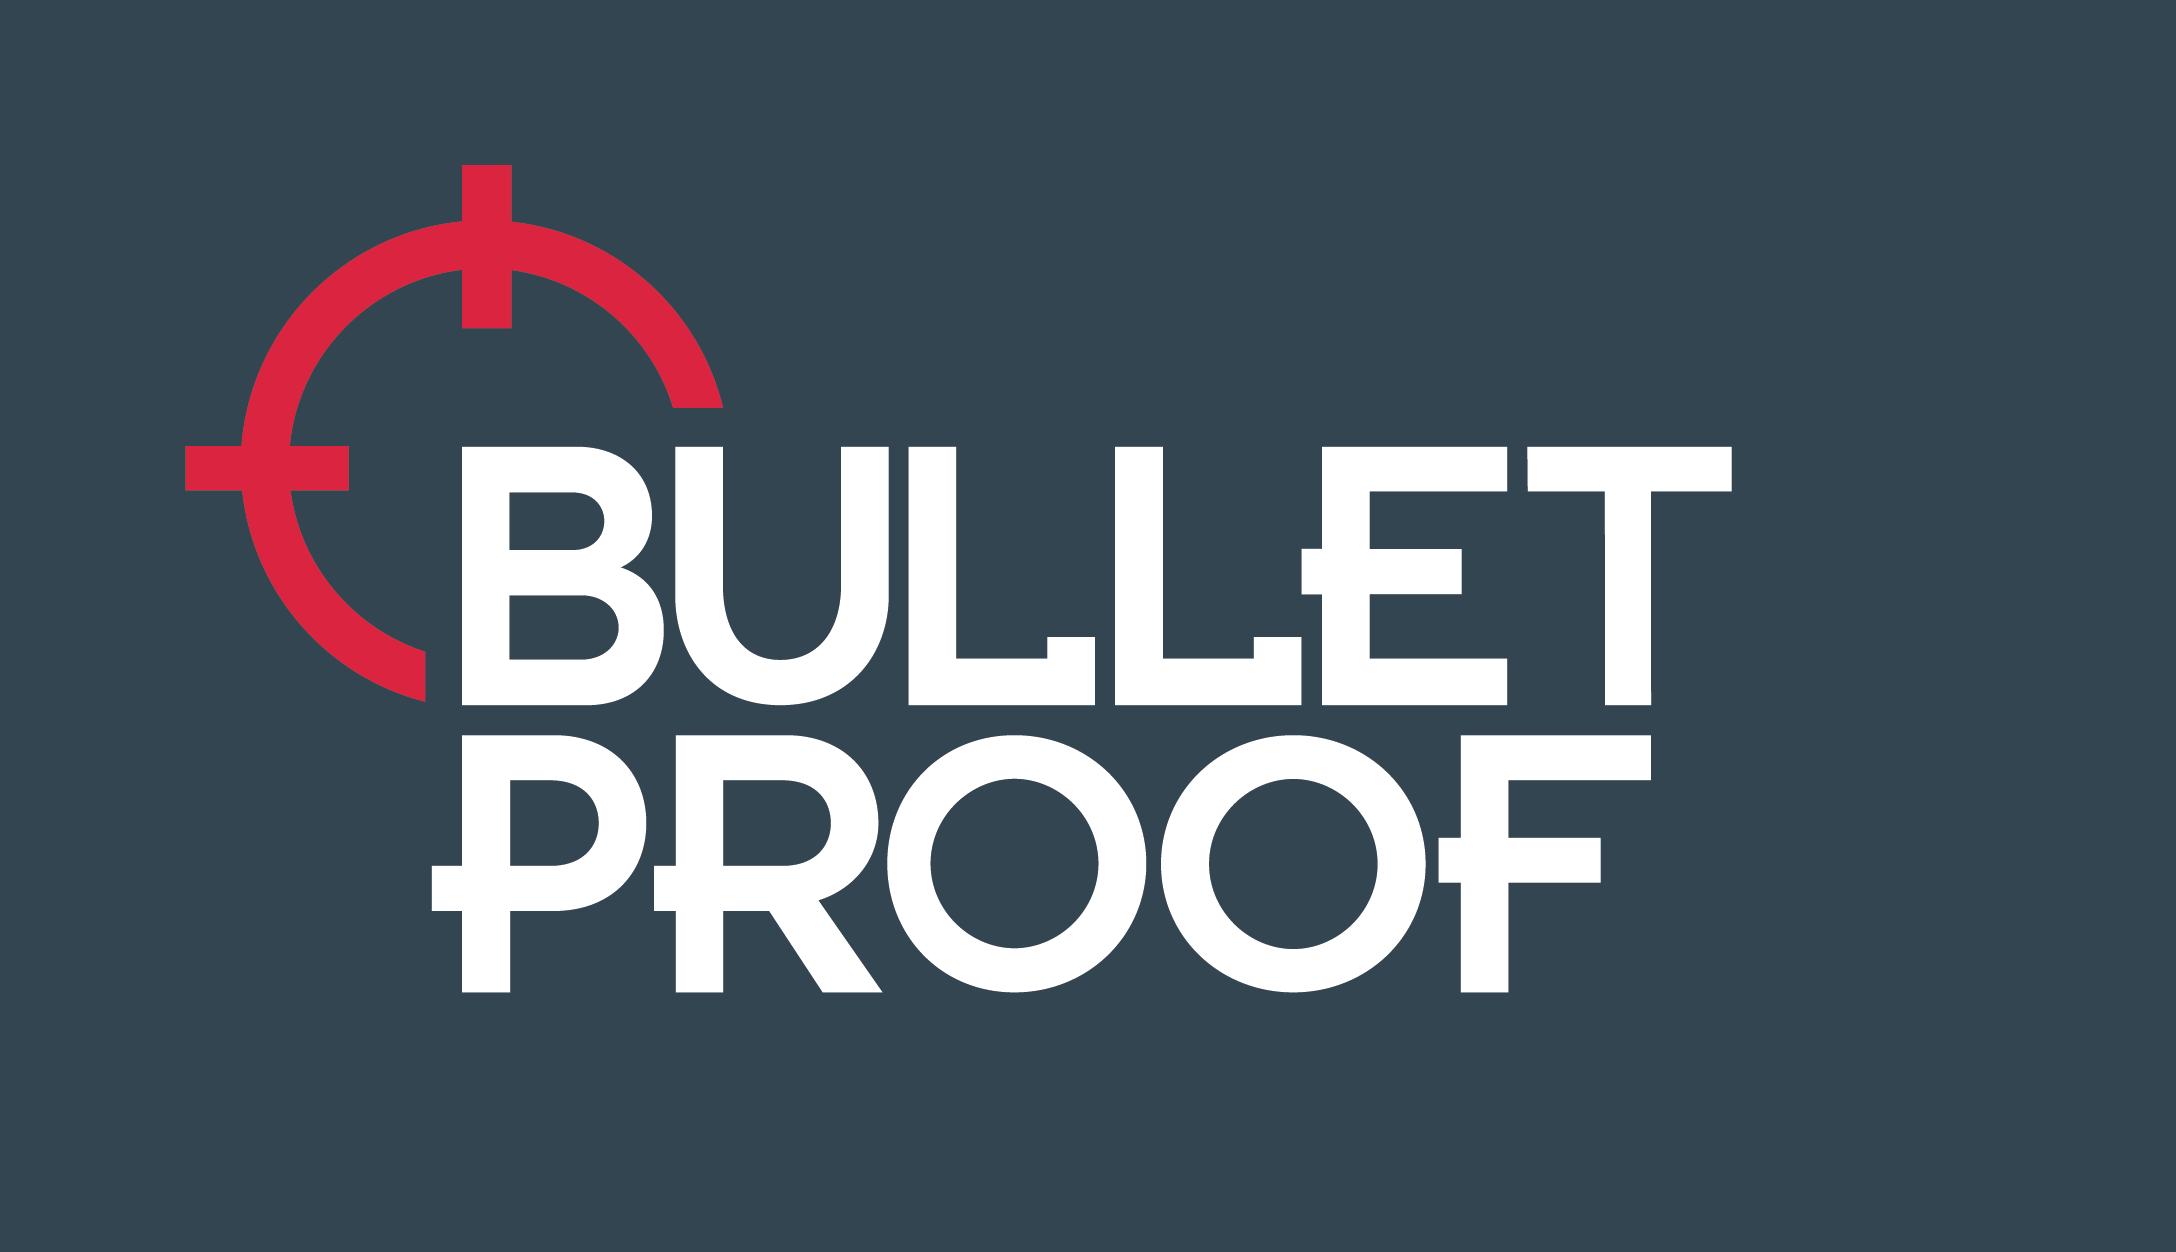 Bulletproof Logo Crest Fredzoller Com